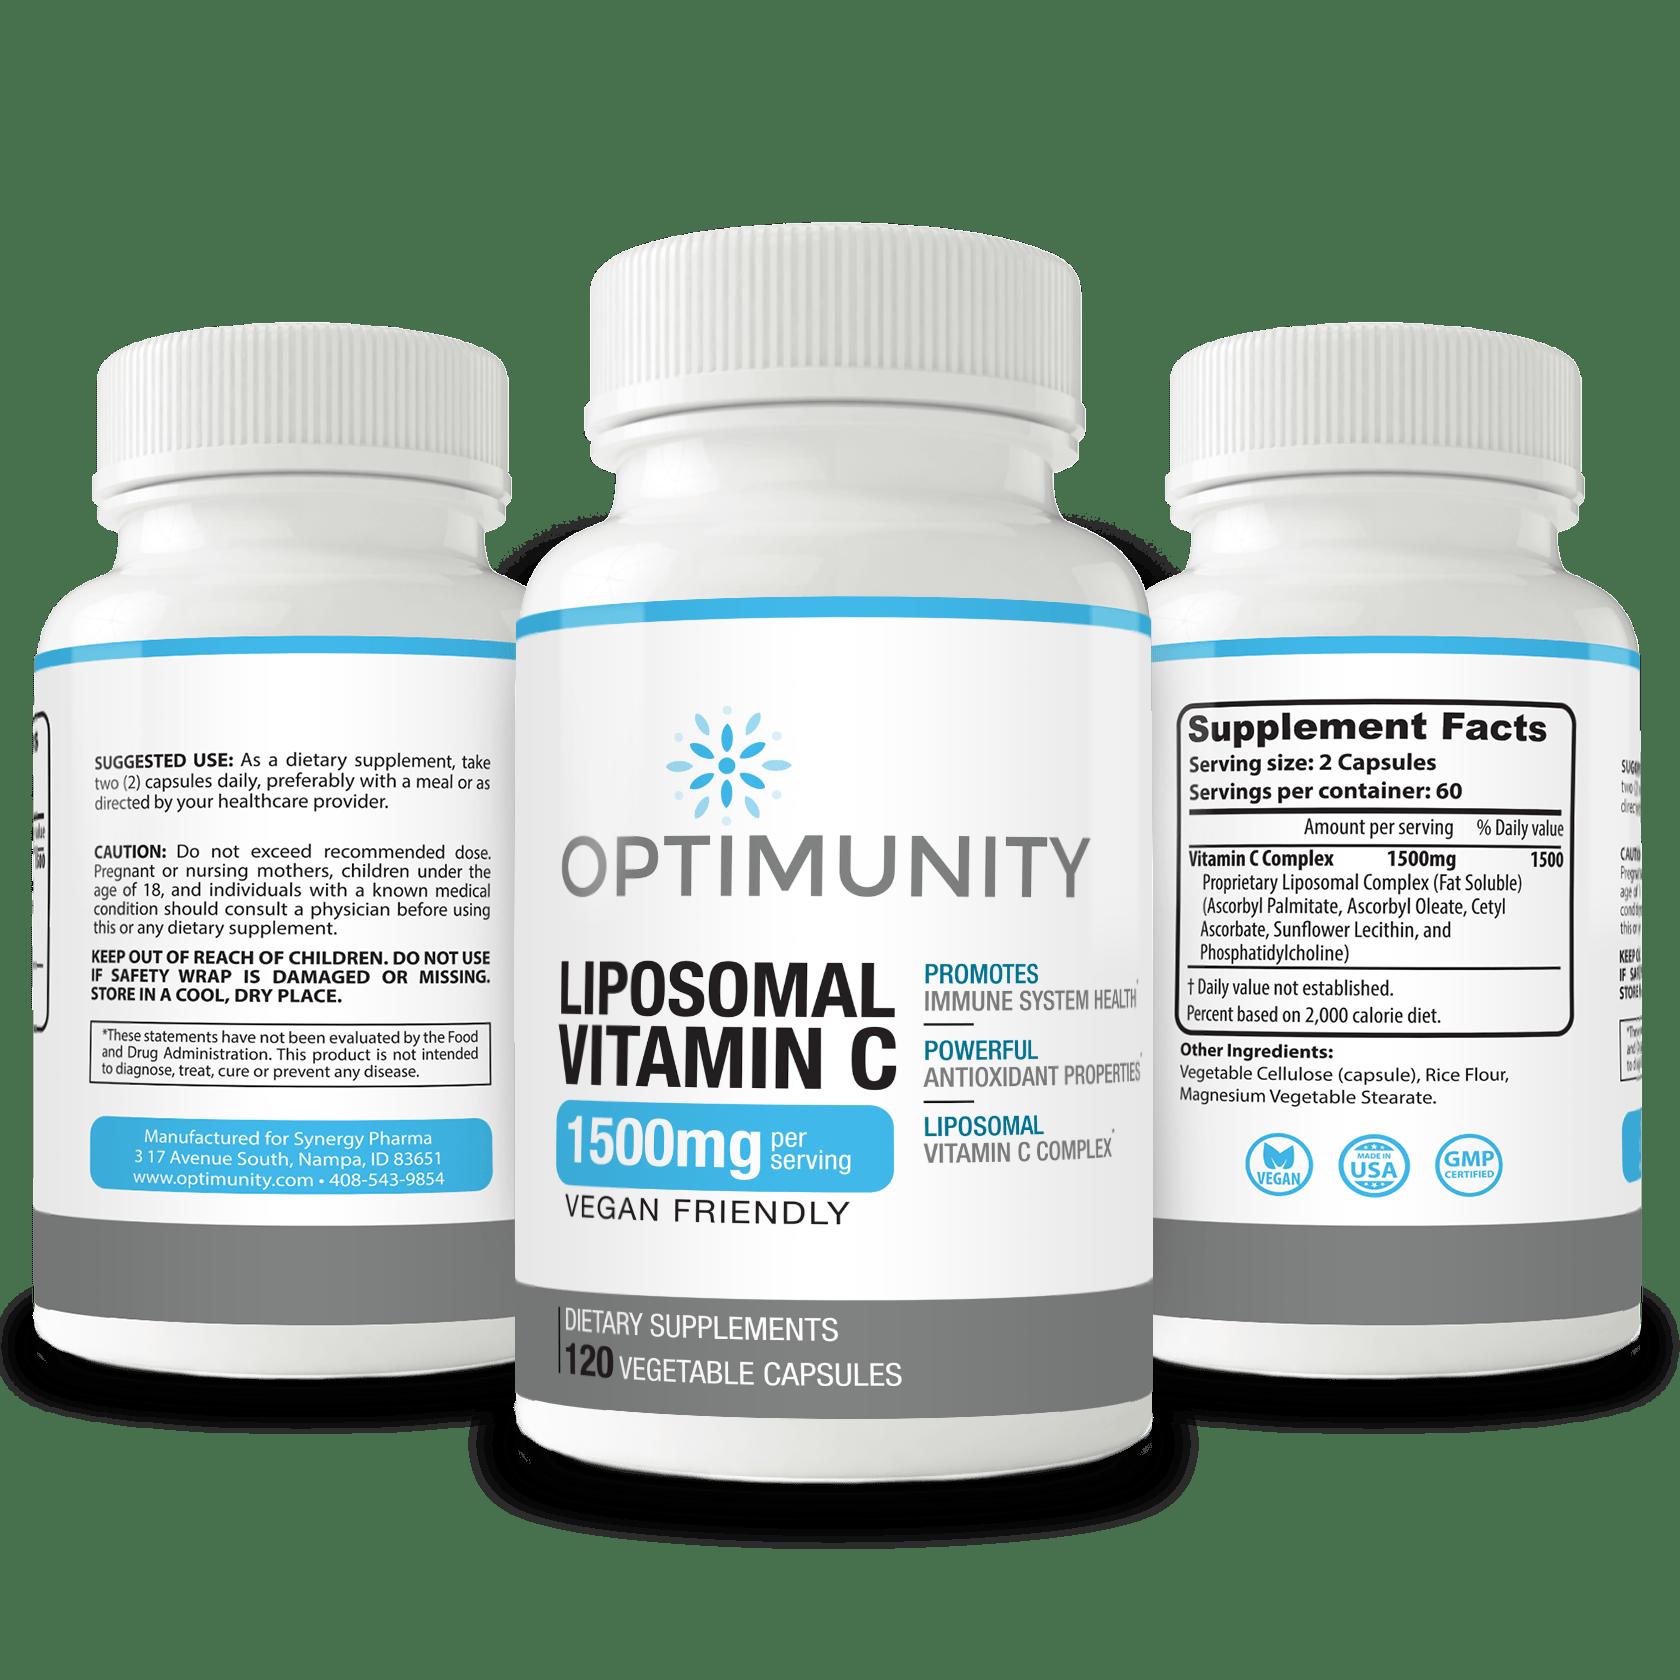 Optimunity Immune system booster